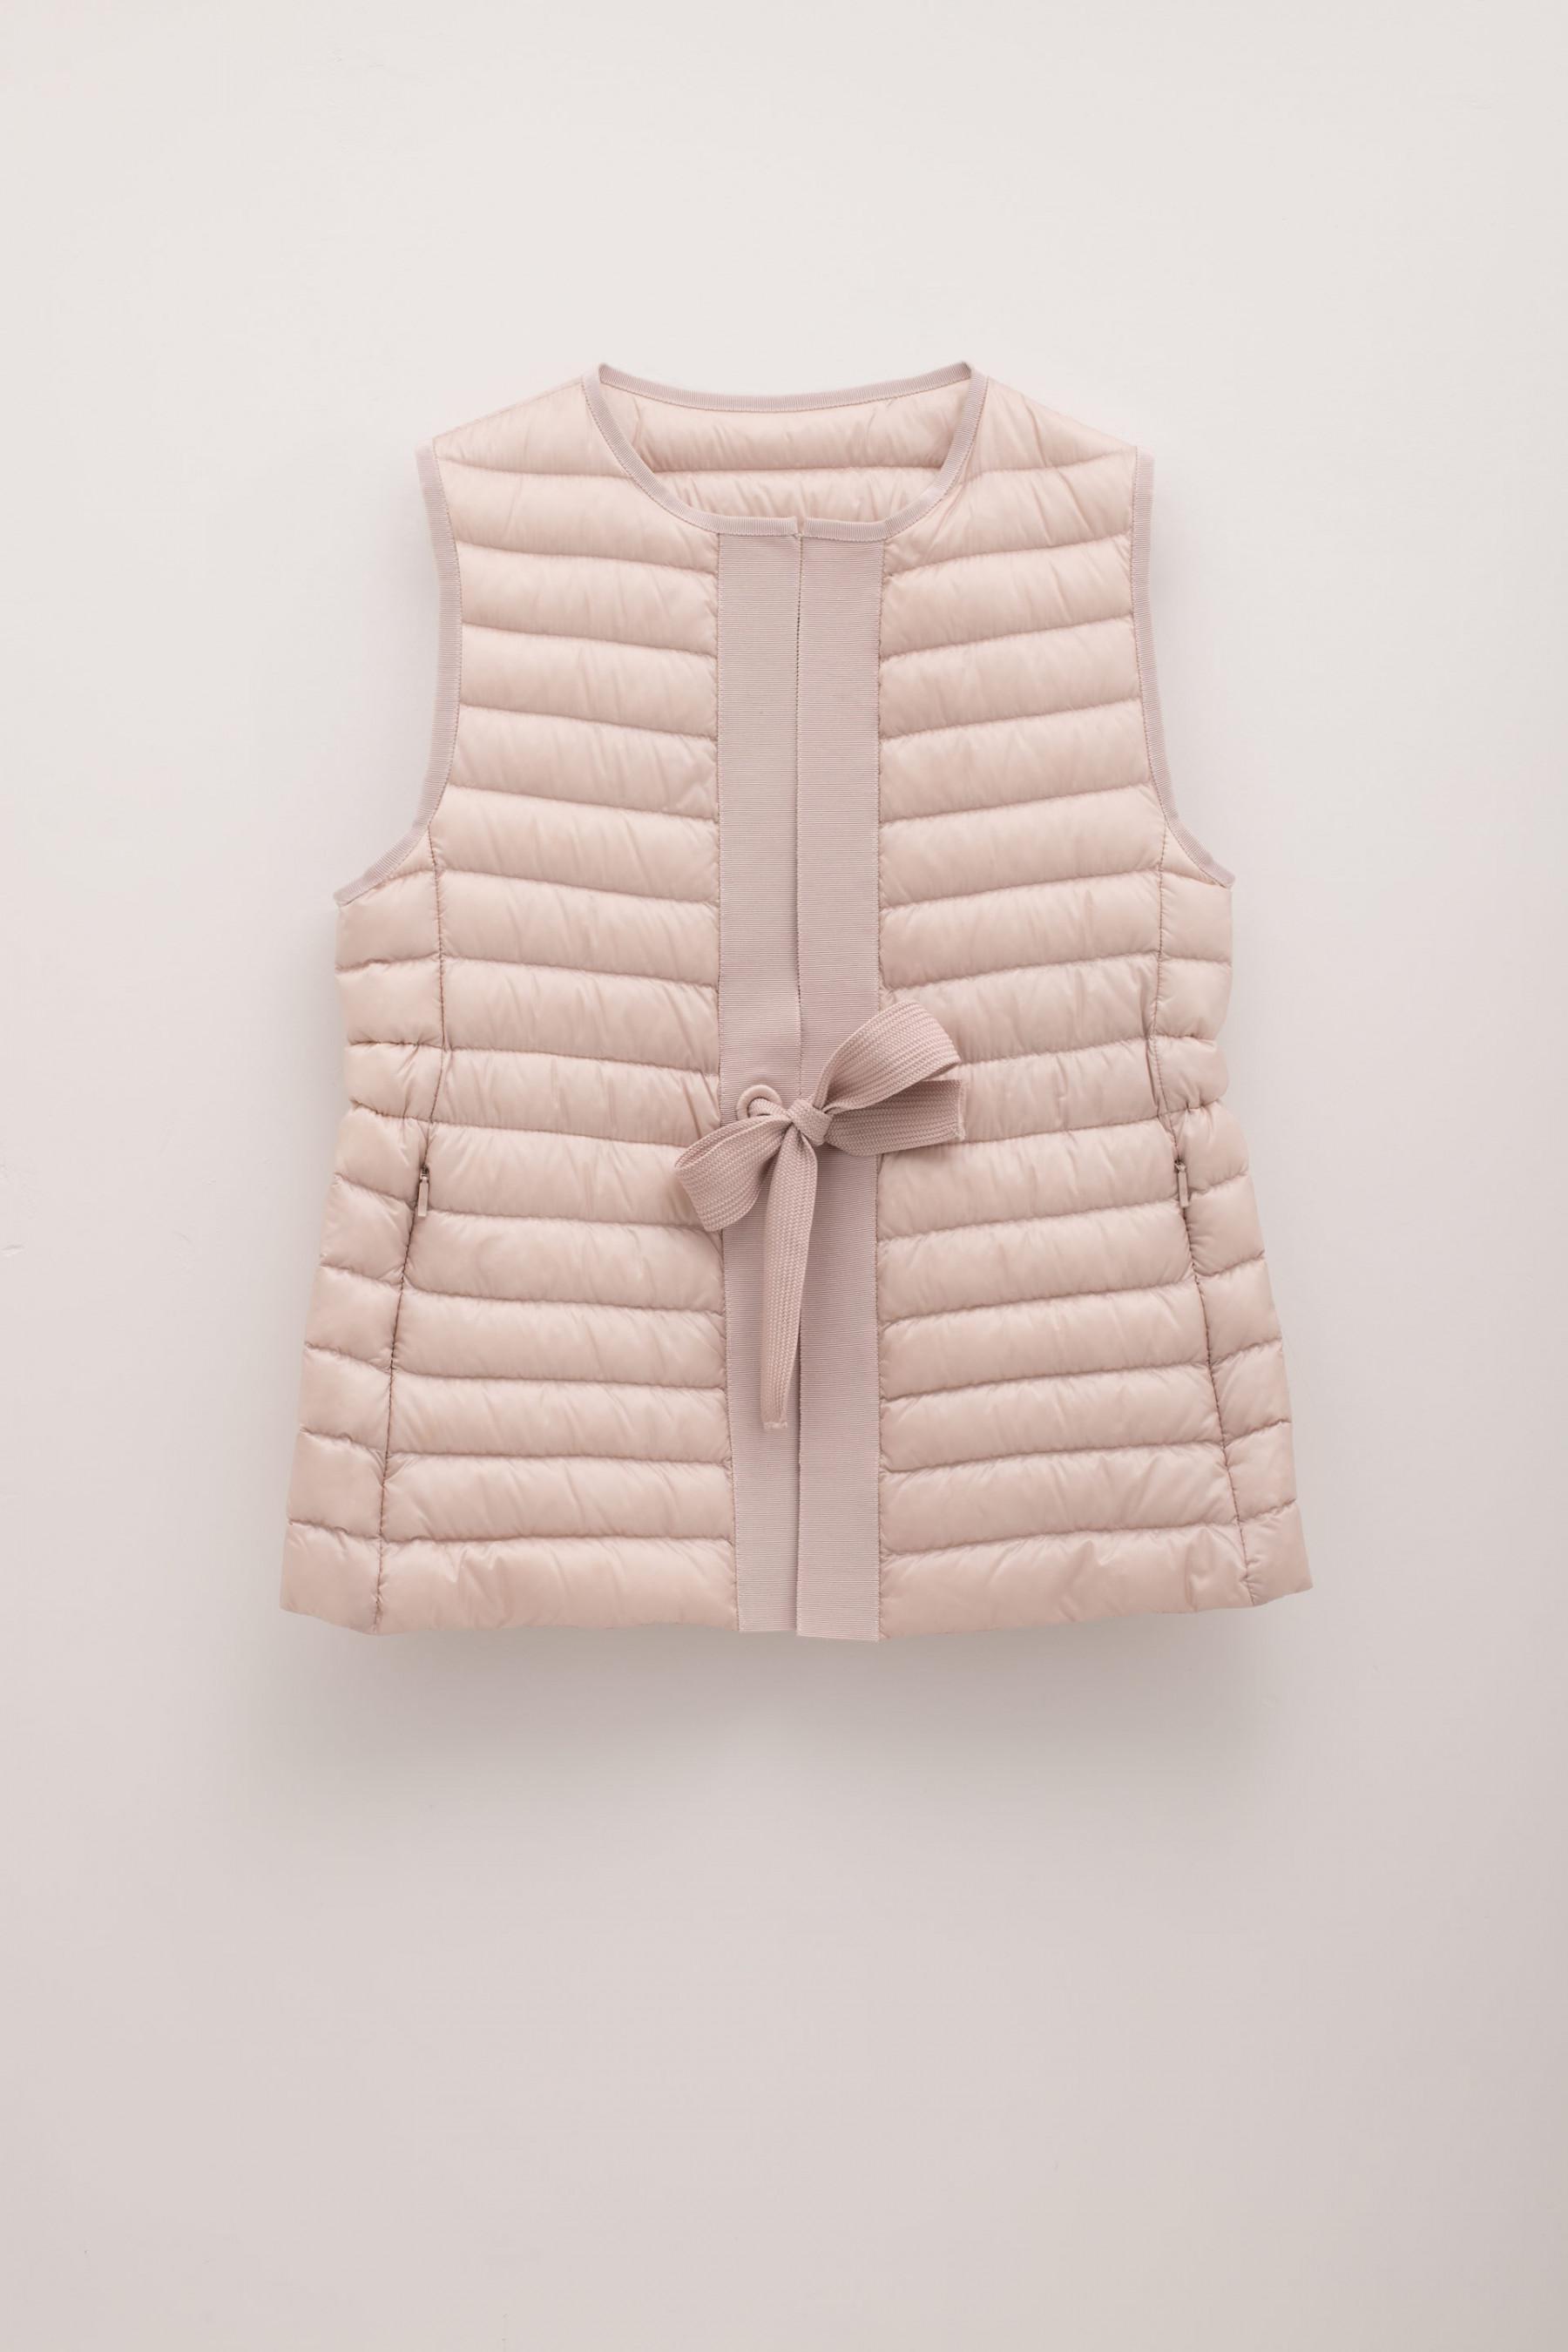 43c02f56348 switzerland moncler vest pink website victoria 6ad0a 90d25